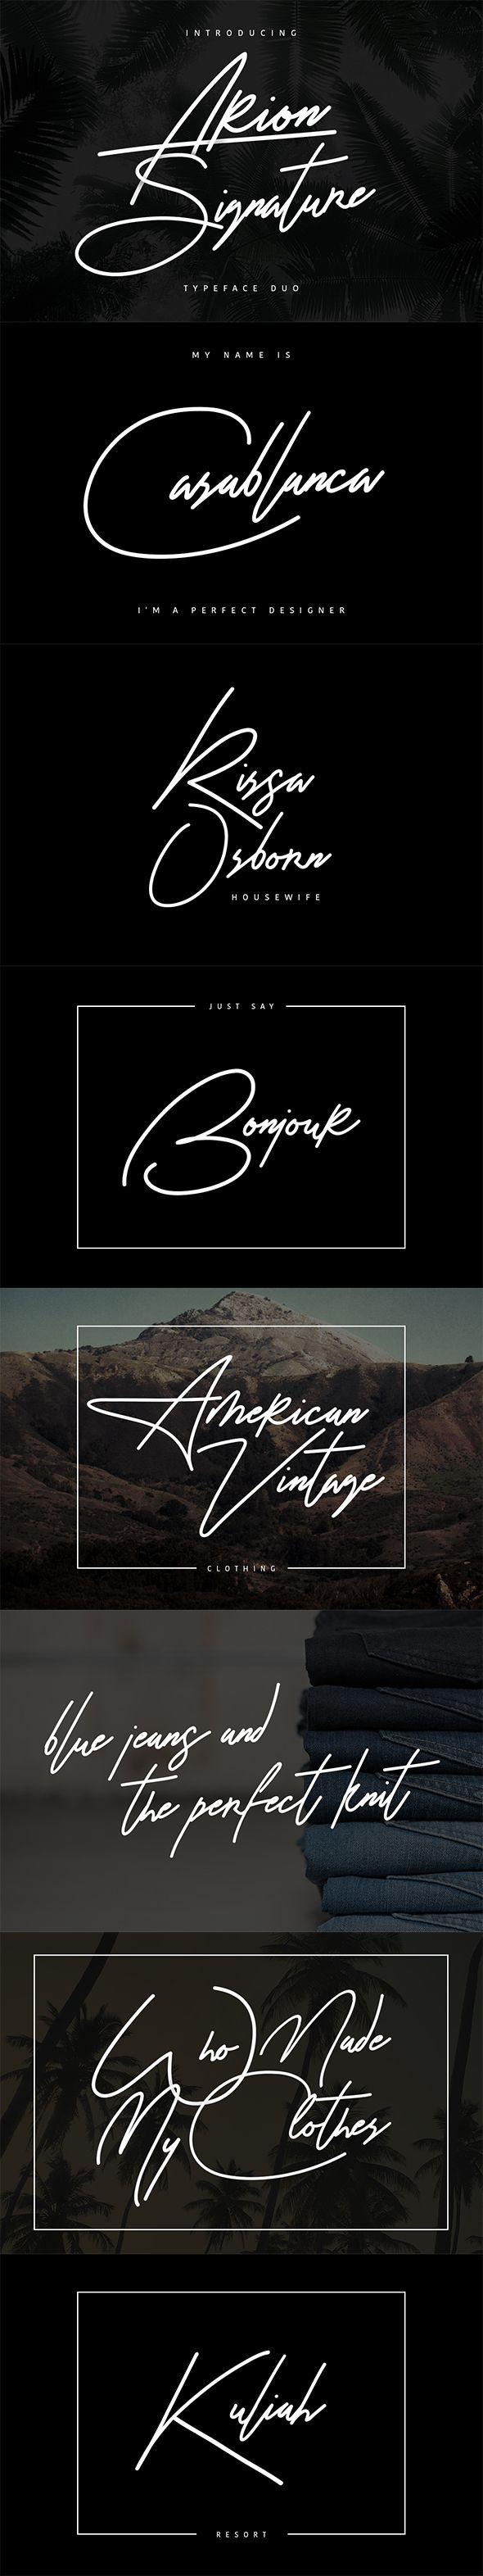 Arion Signature Typeface - Calligraphy Script Download here: https://graphicriver.net/item/arion-signature-typeface/19538564?ref=alena994